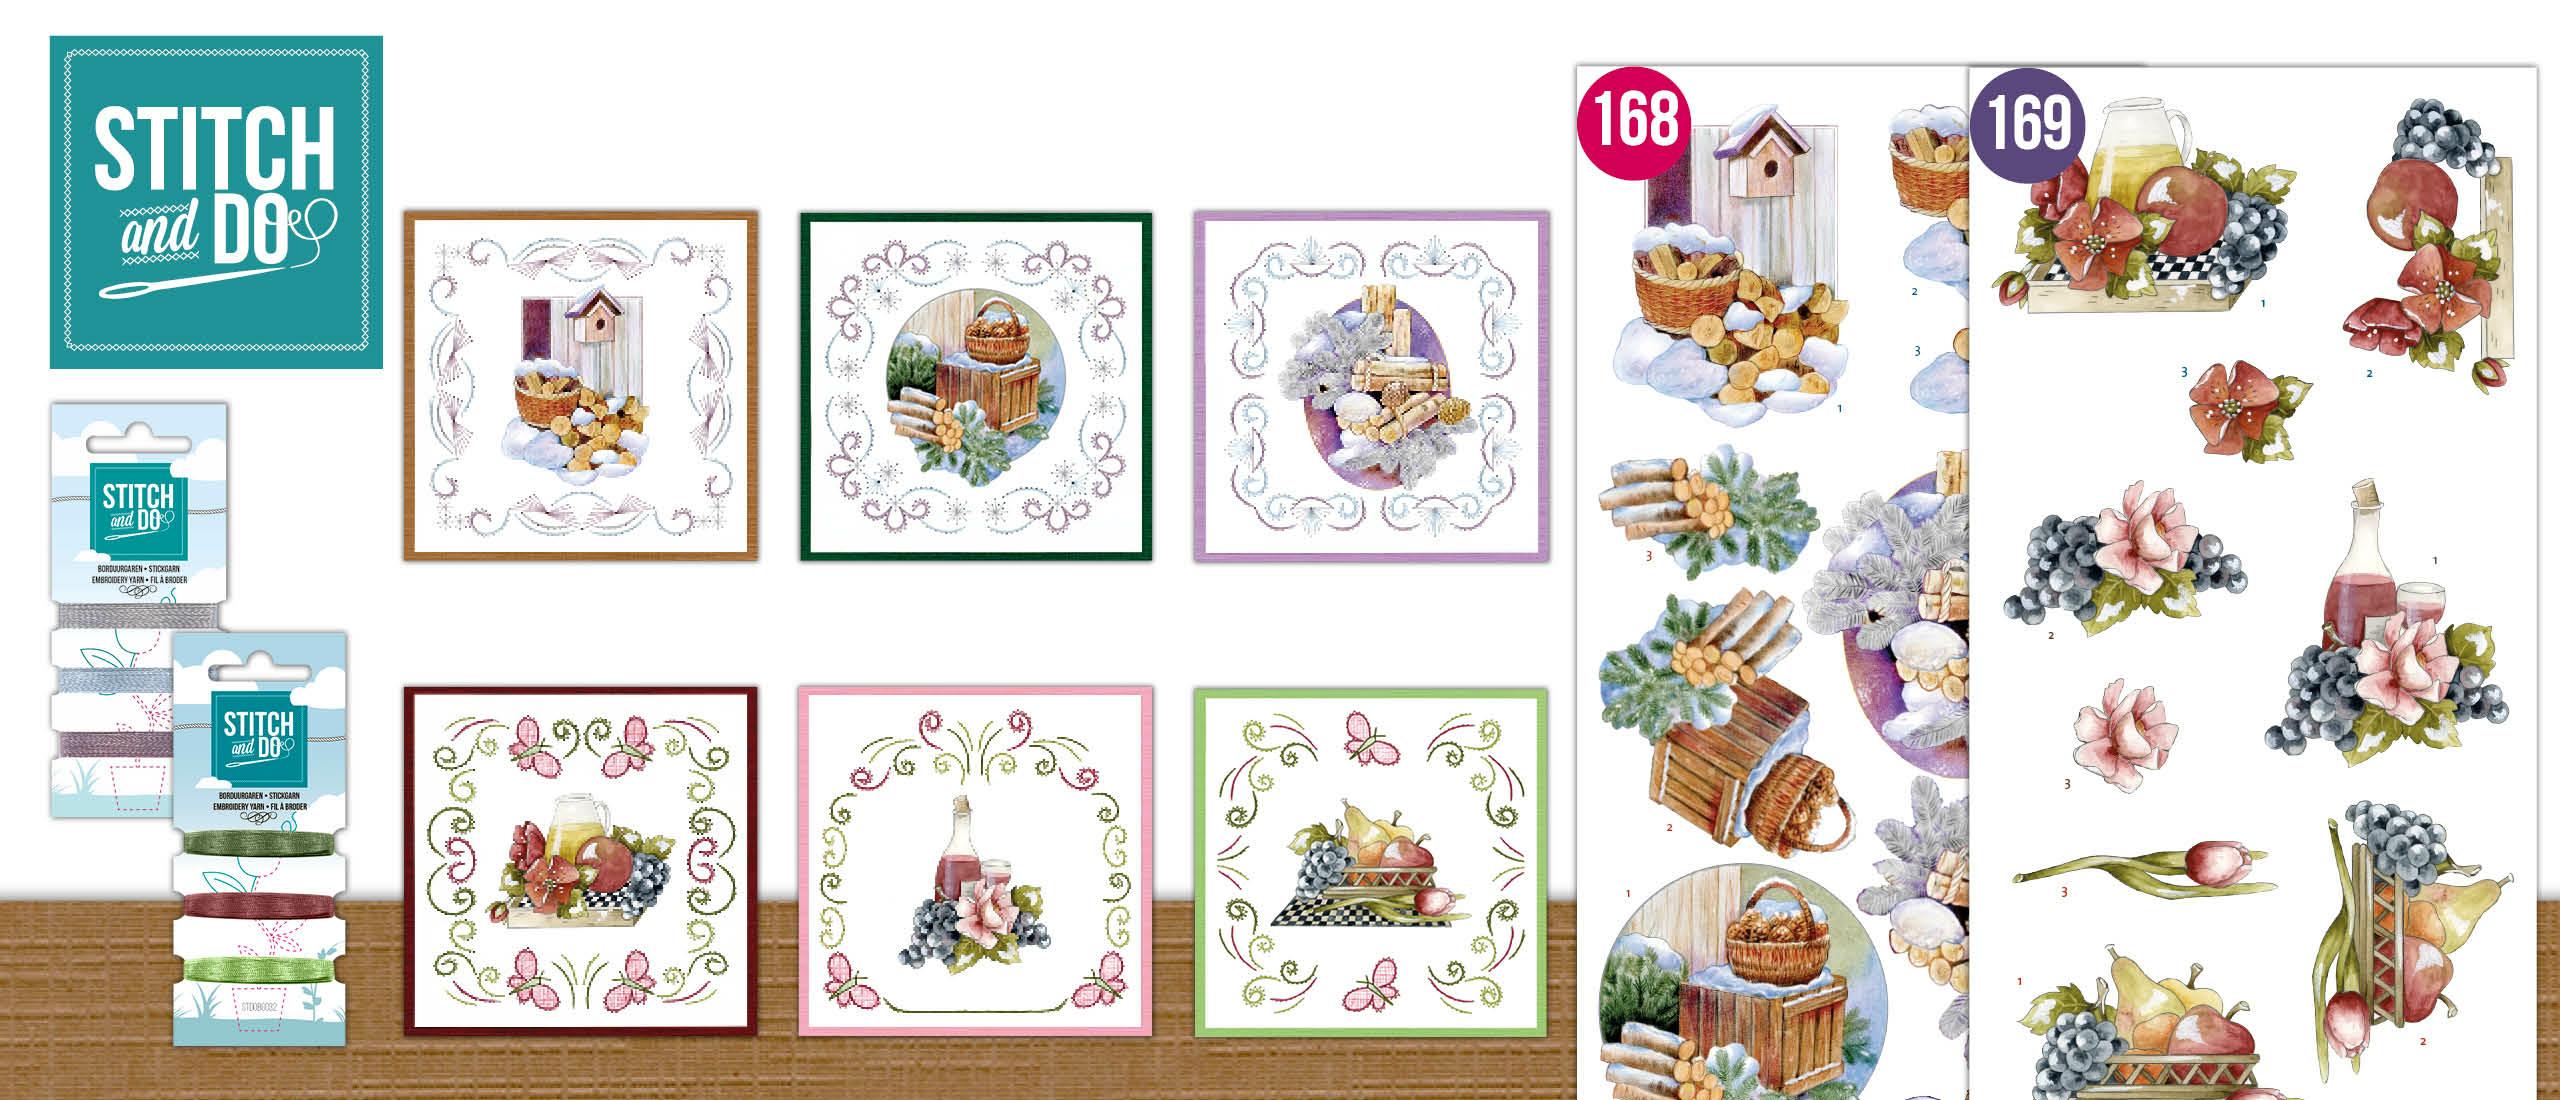 Stitch and Do - Jeanine's Art - Winter Charme - Wood en Precious Marieke - Flowers and Fruits - Flowers and Grapes (STDO168 -STDO169)